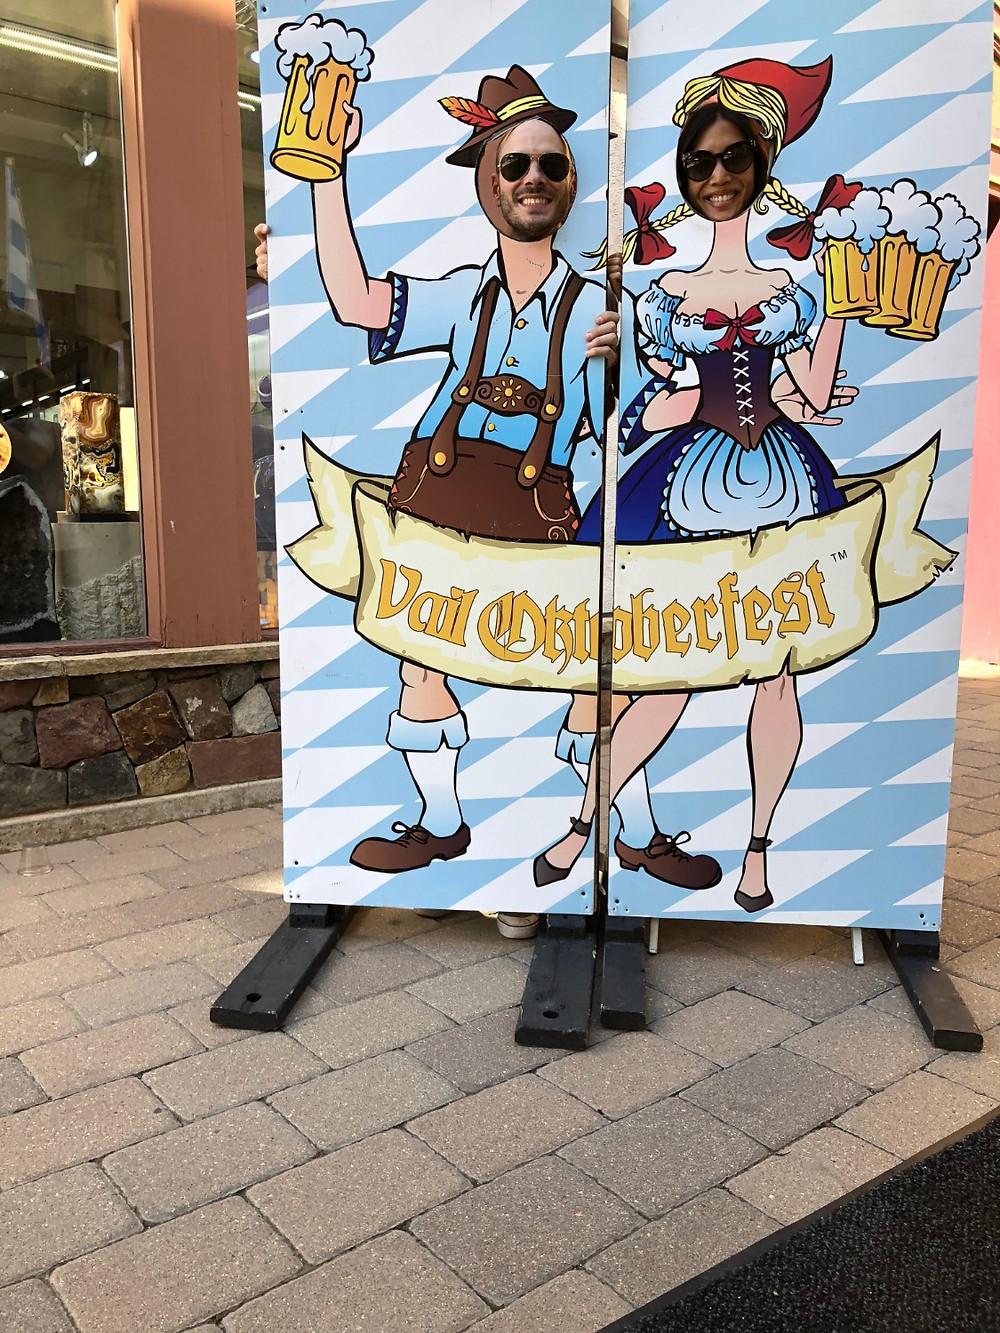 Lionshead Village, Lionshead Village for kids, Curious G and Me, Lionshead Village playground, Vail Oktoberfest